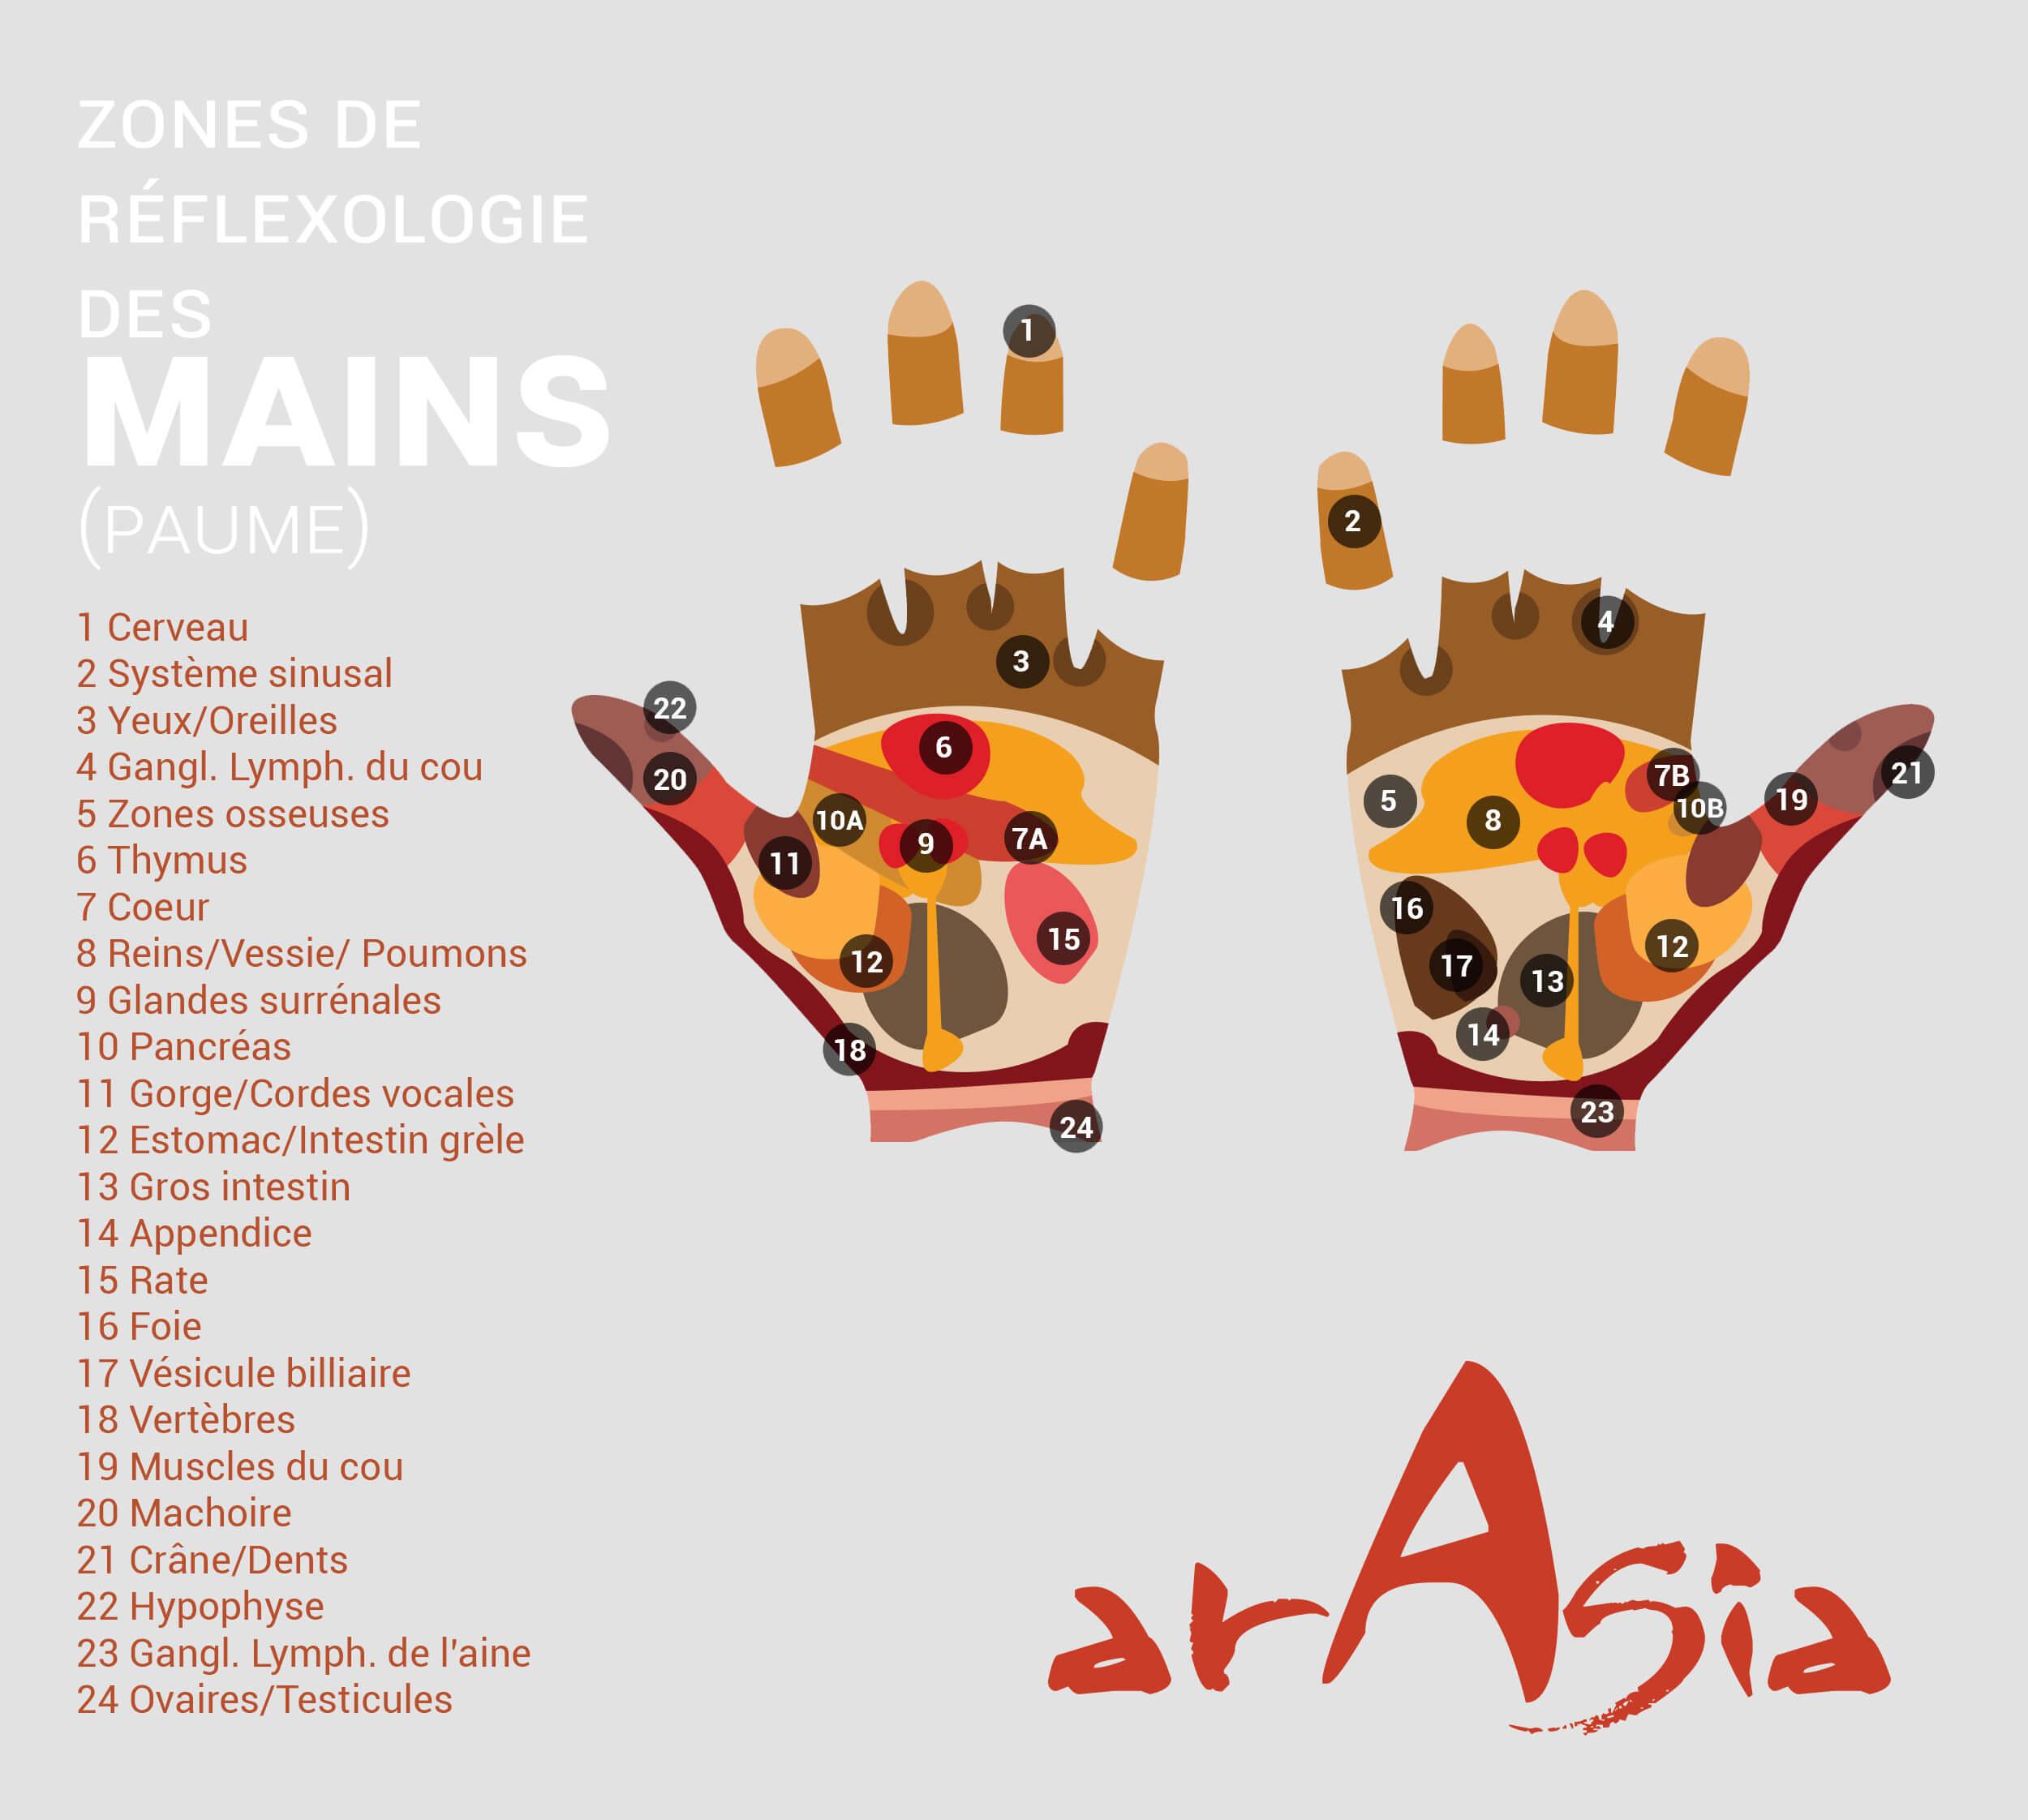 carte reflexologie paume des mains ARASIA